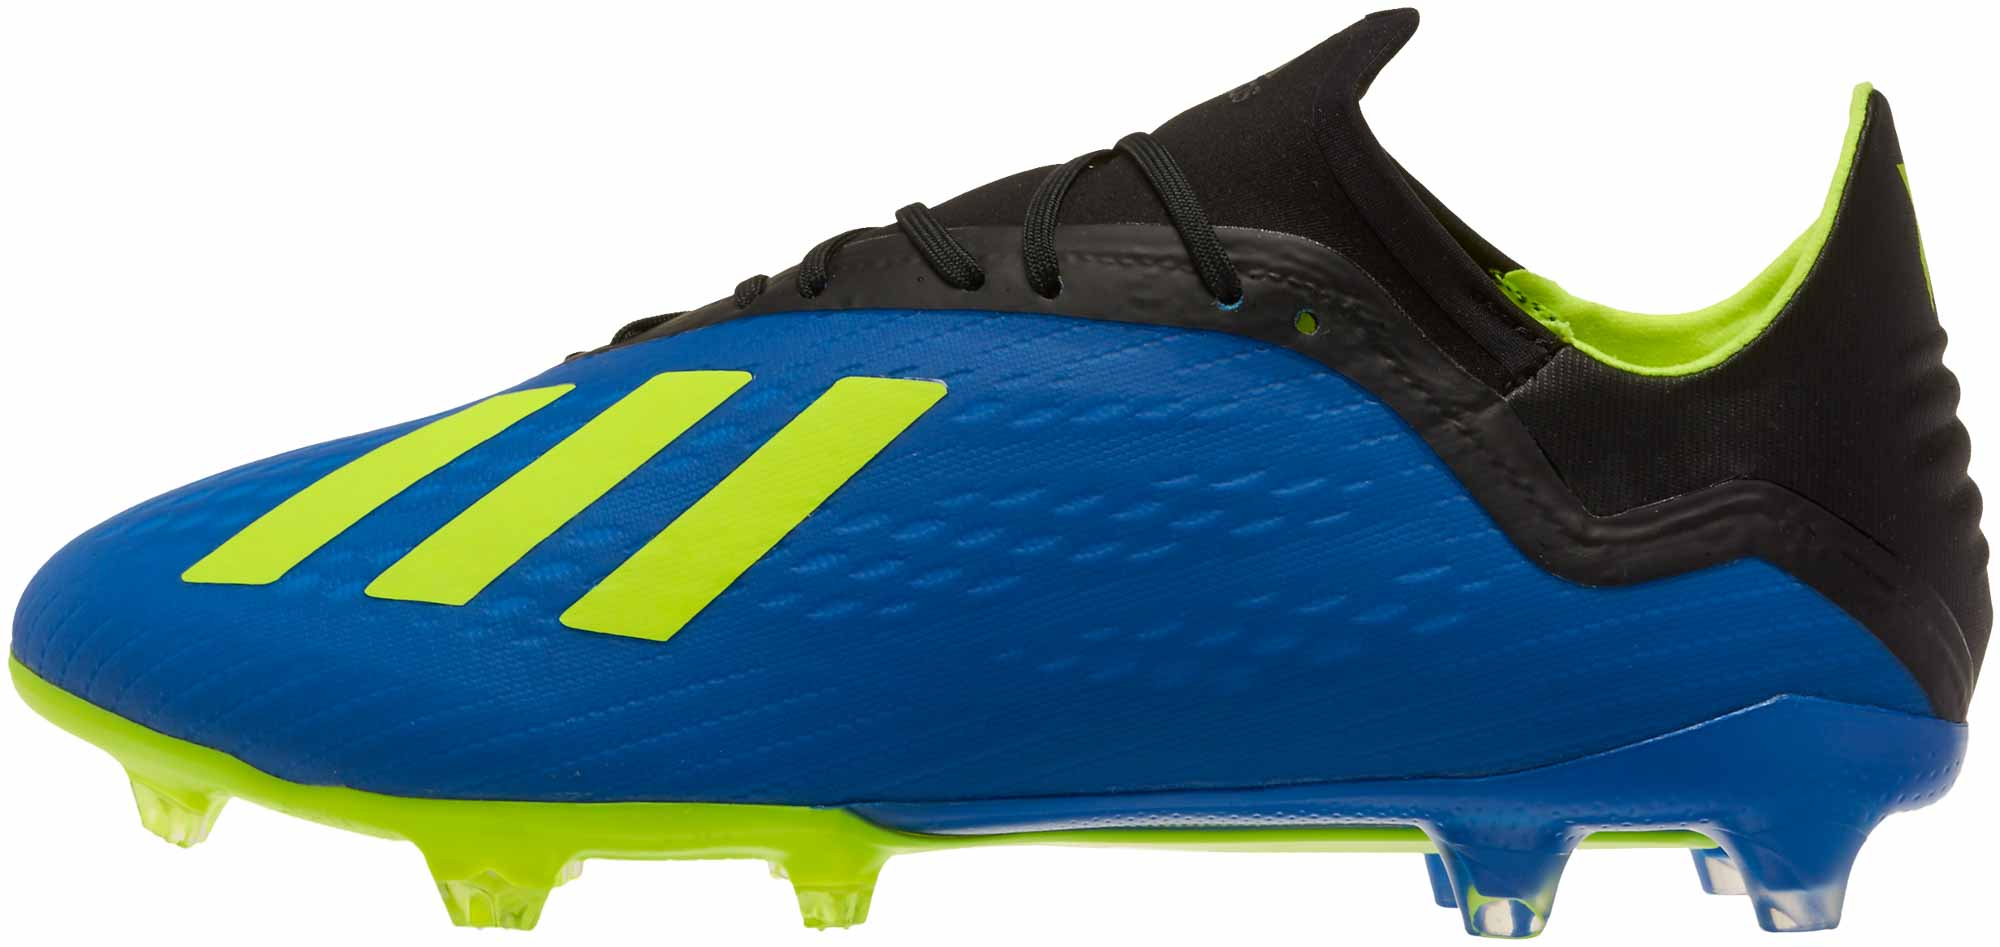 Adidas X 182 Fg Football Blue Adidas Soccer Cleats Soccerprocom